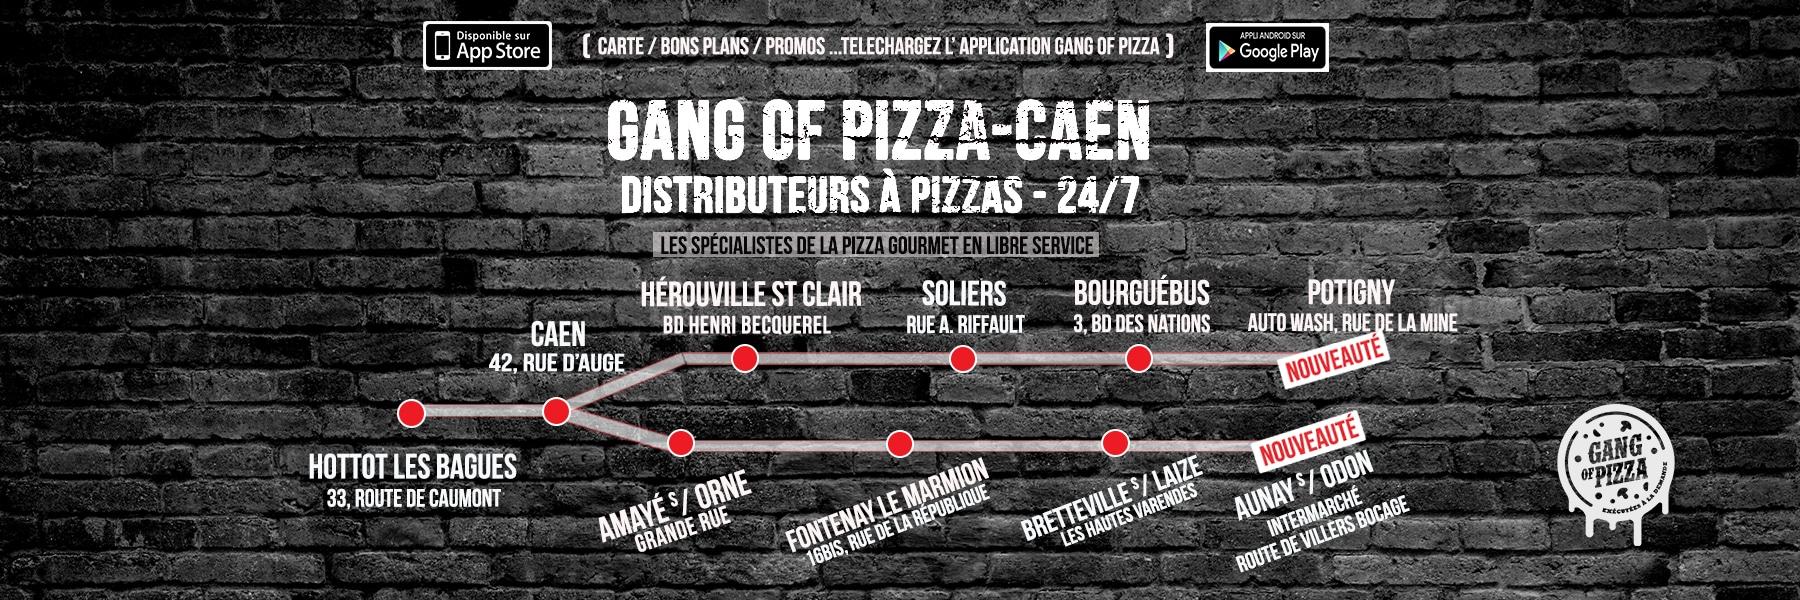 GANG OF PIZZA PLAINE DE CAEN